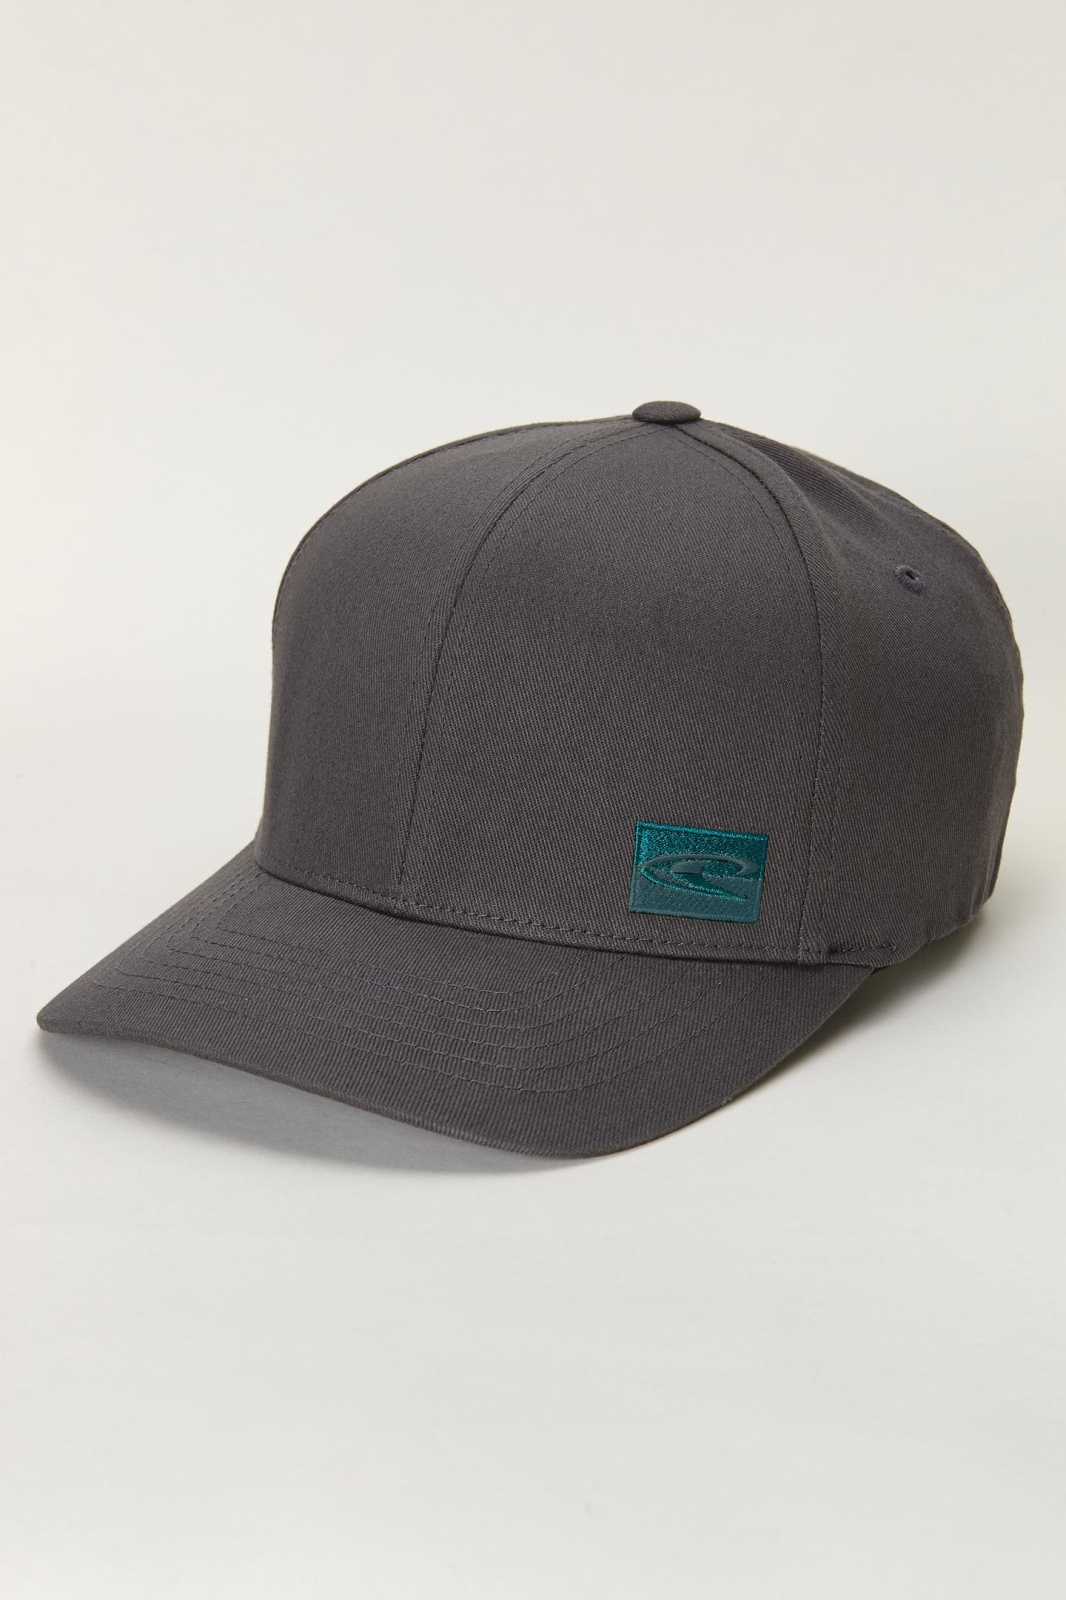 ONEILL SLODOWN HAT